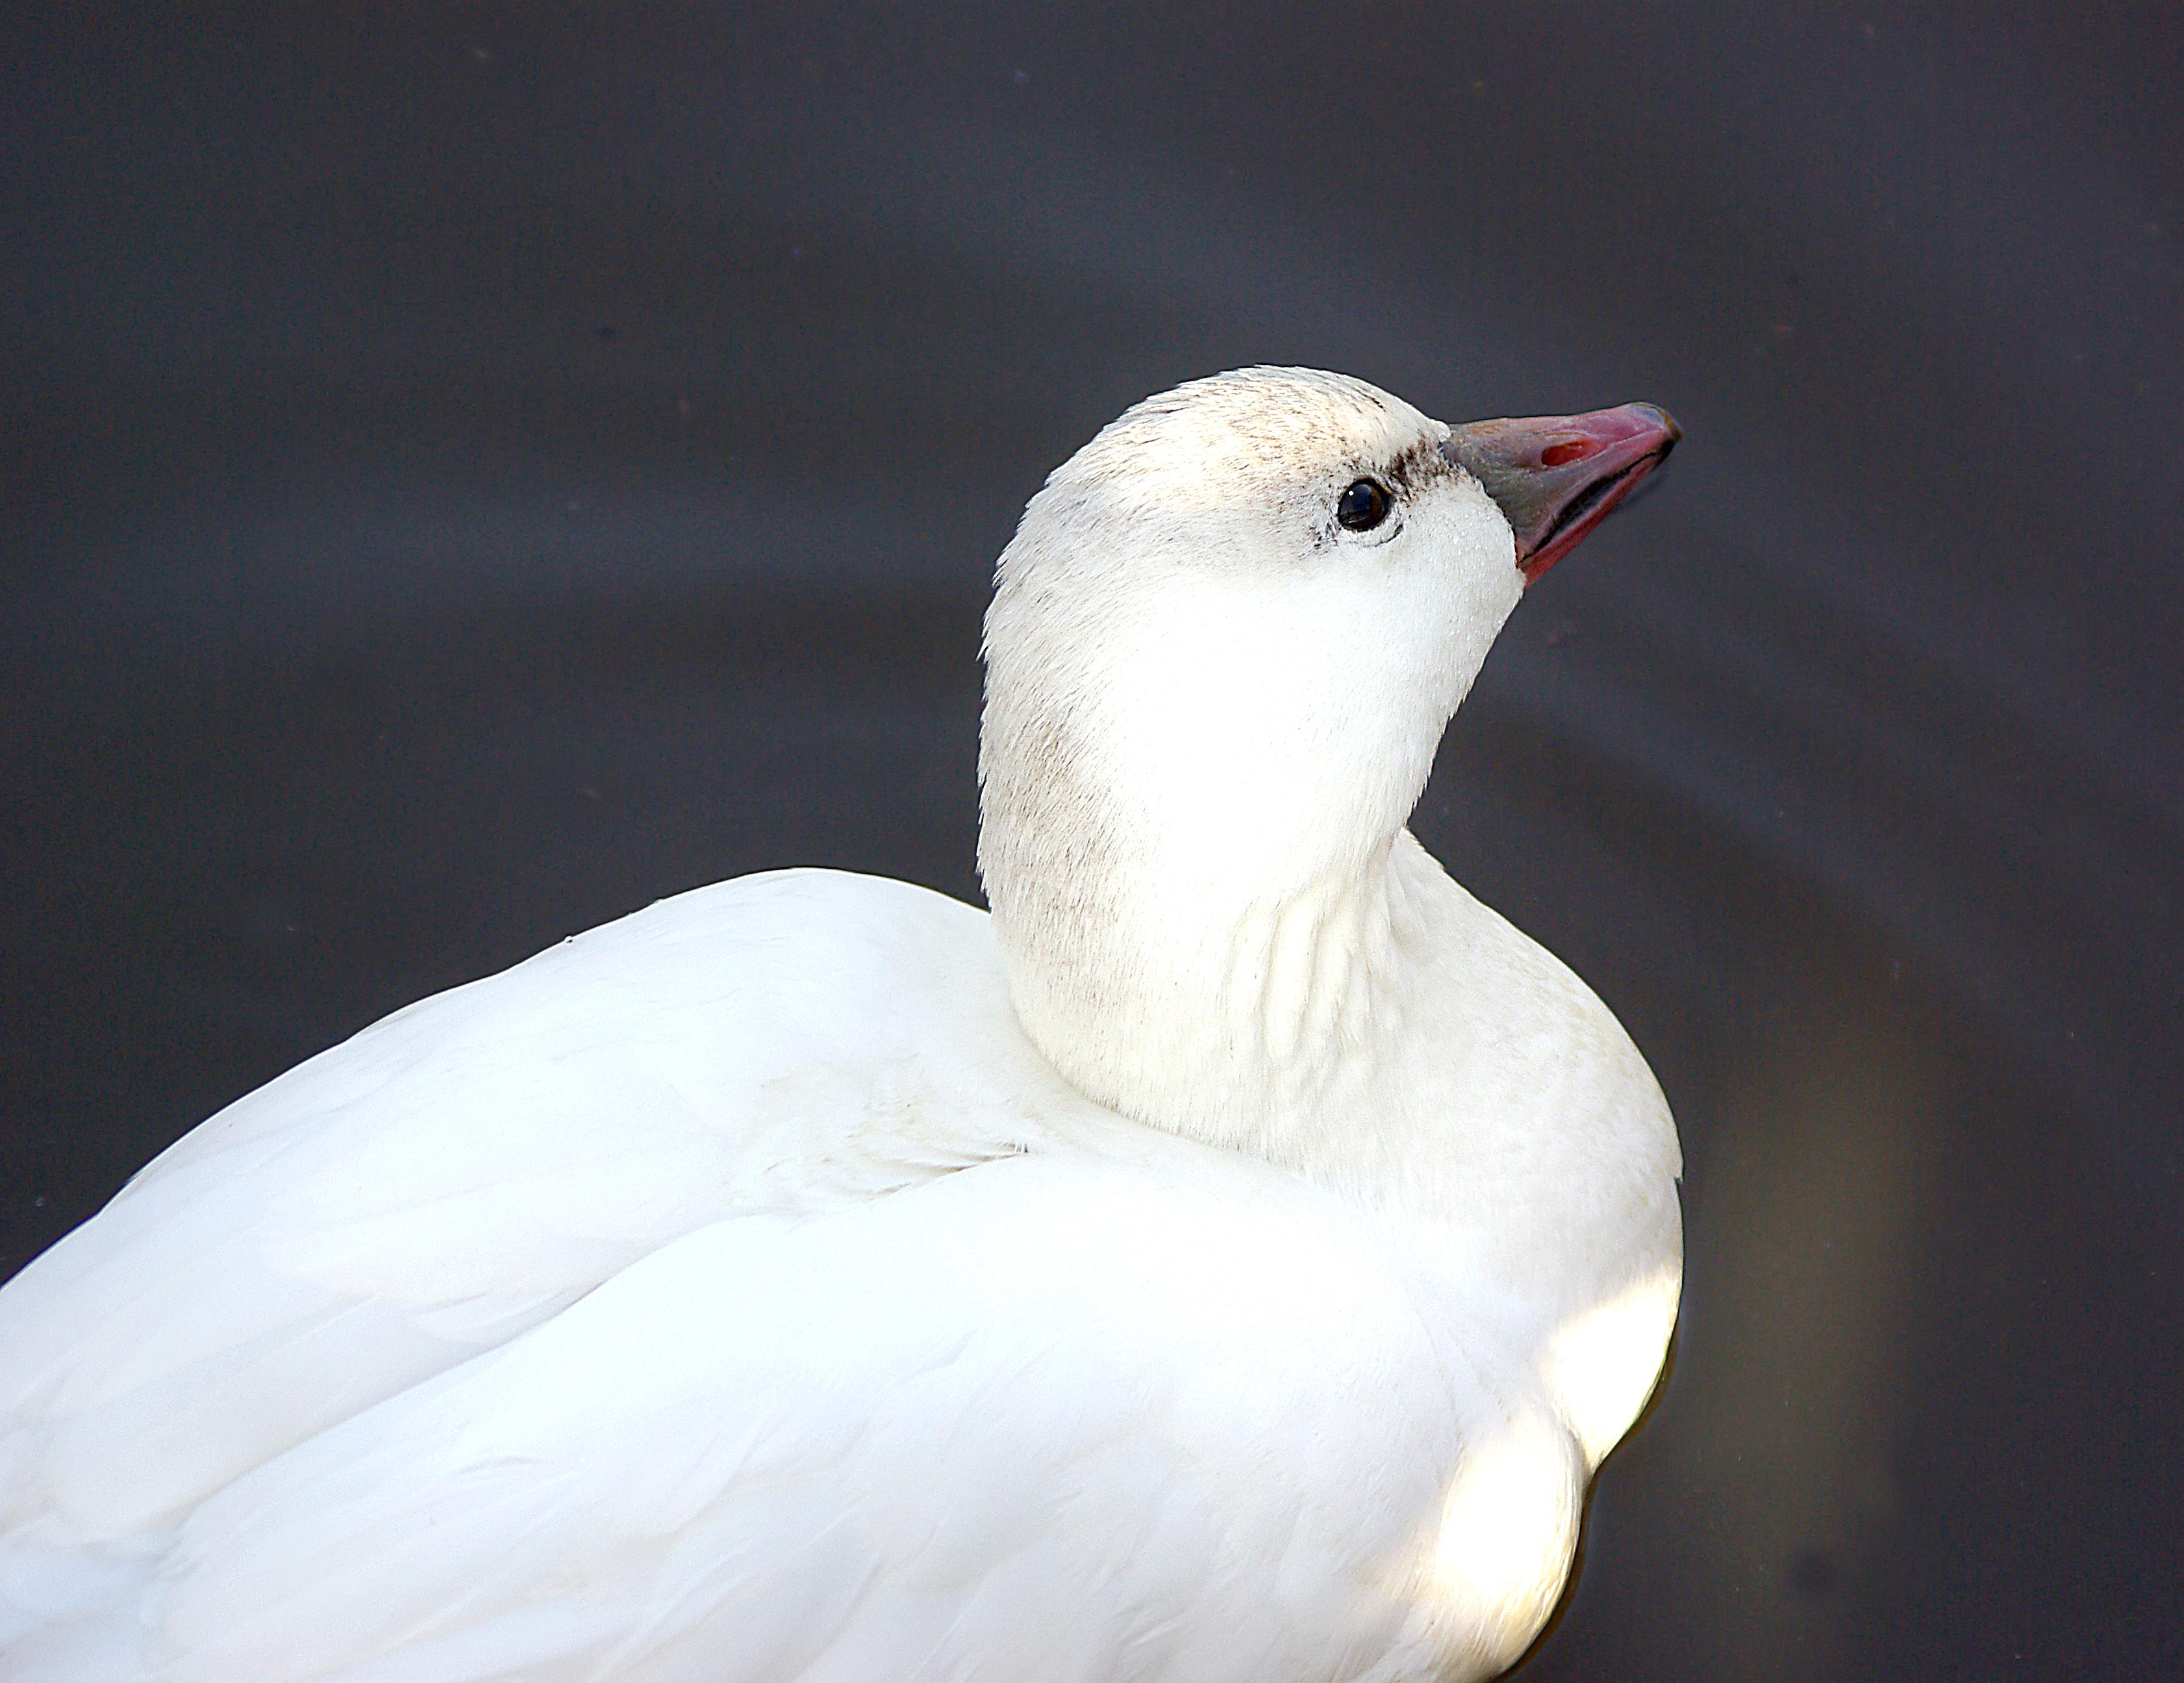 013 - ross's goose (1-6-07) laguna lake, sloco, ca (4) photo